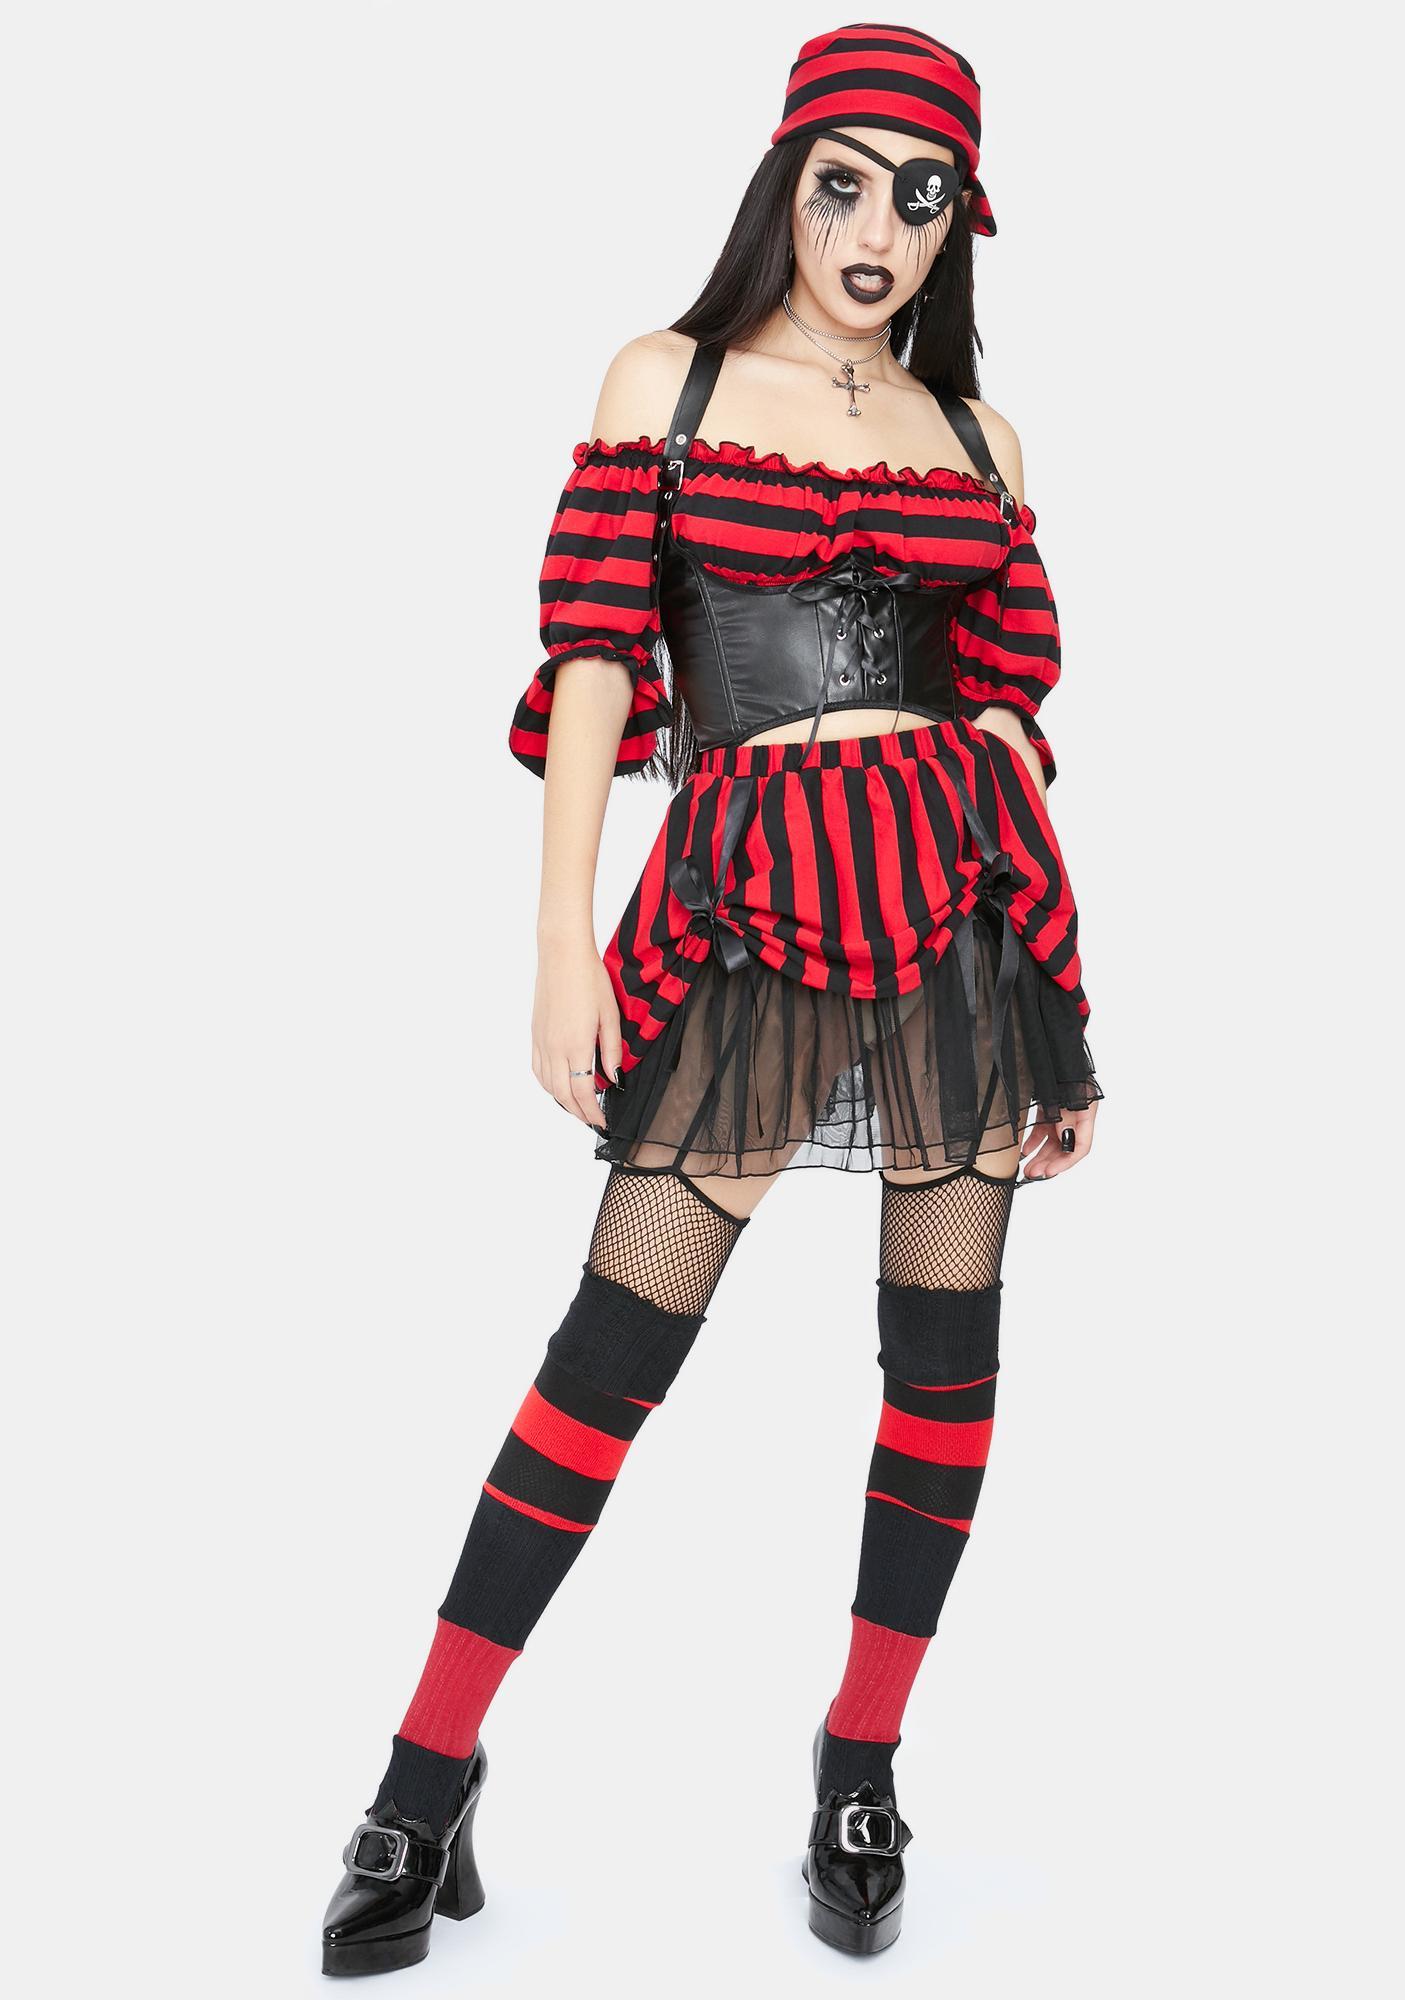 Trickz N' Treatz Shiver Me Timbers Pirate Costume